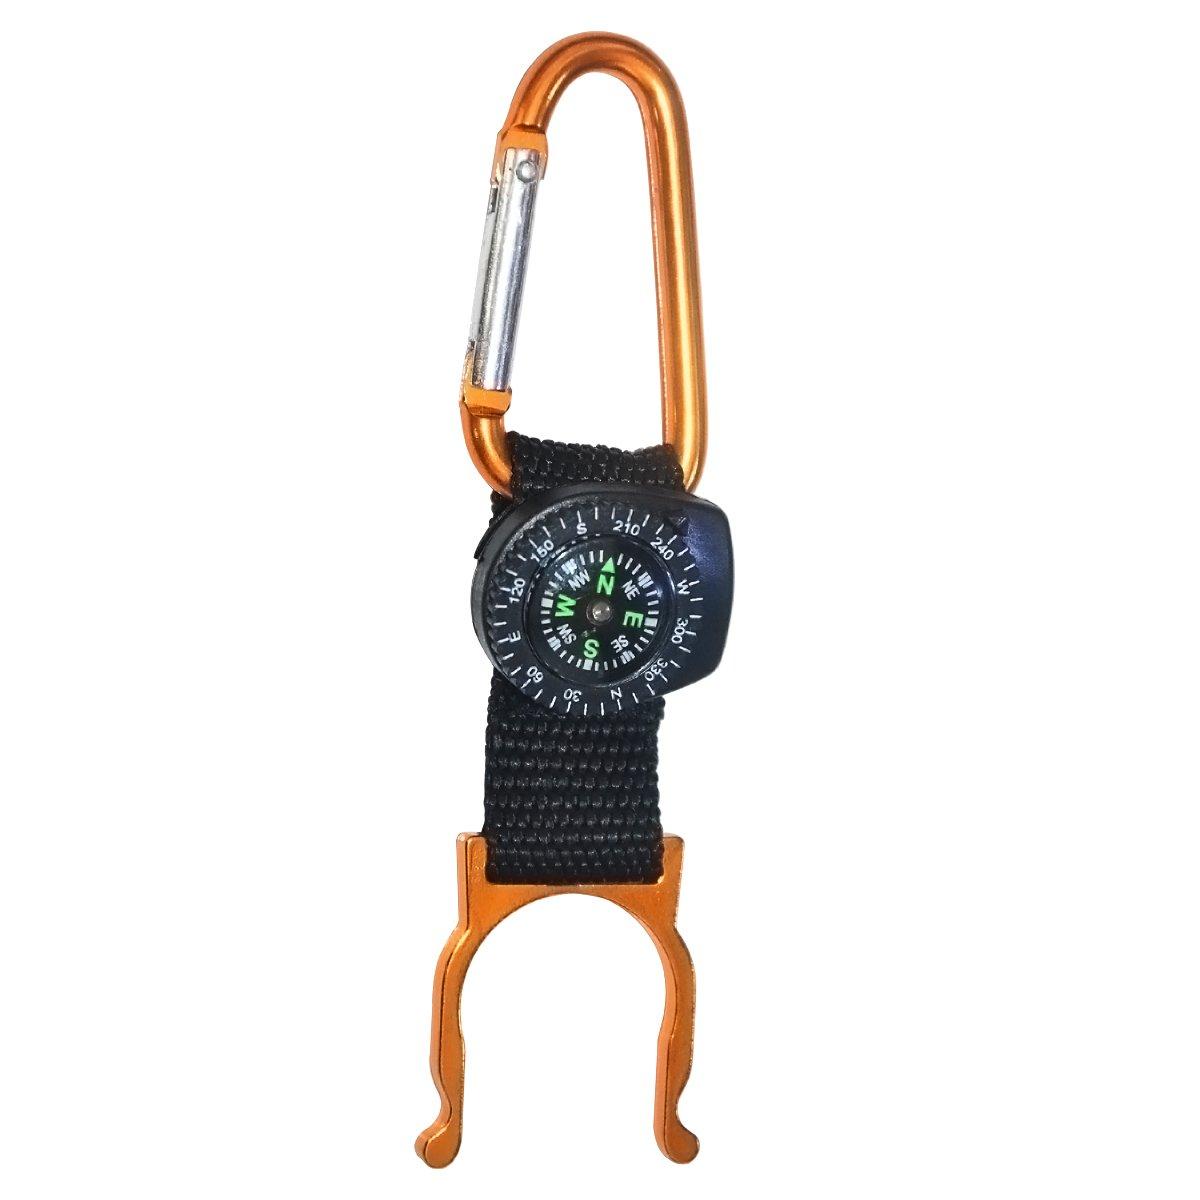 yzxliボトルボアクイックHangingボトルバックル、ミネラル水ボトルバックル、キャンプのためのコンパスとハイキングミネラル水飲料ボトルバックル B075CZPQP6 オレンジ オレンジ